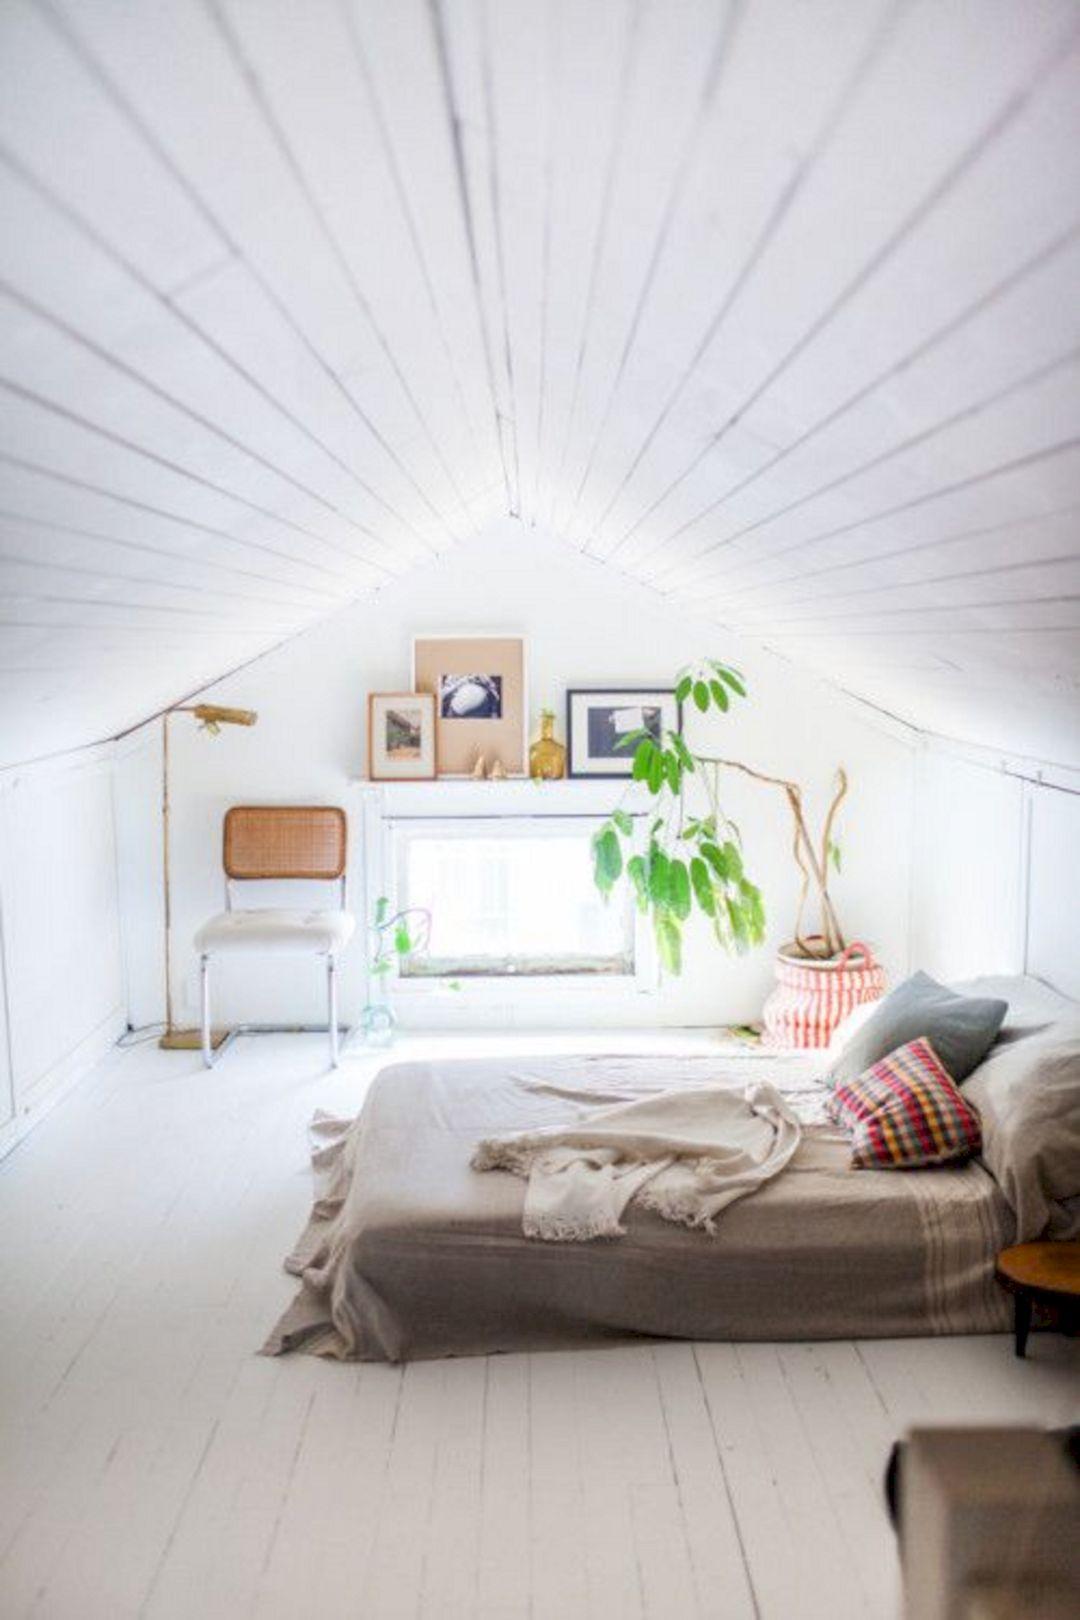 Low Ceiling Attic Bedroom Ideas (Low Ceiling Attic Bedroom ...